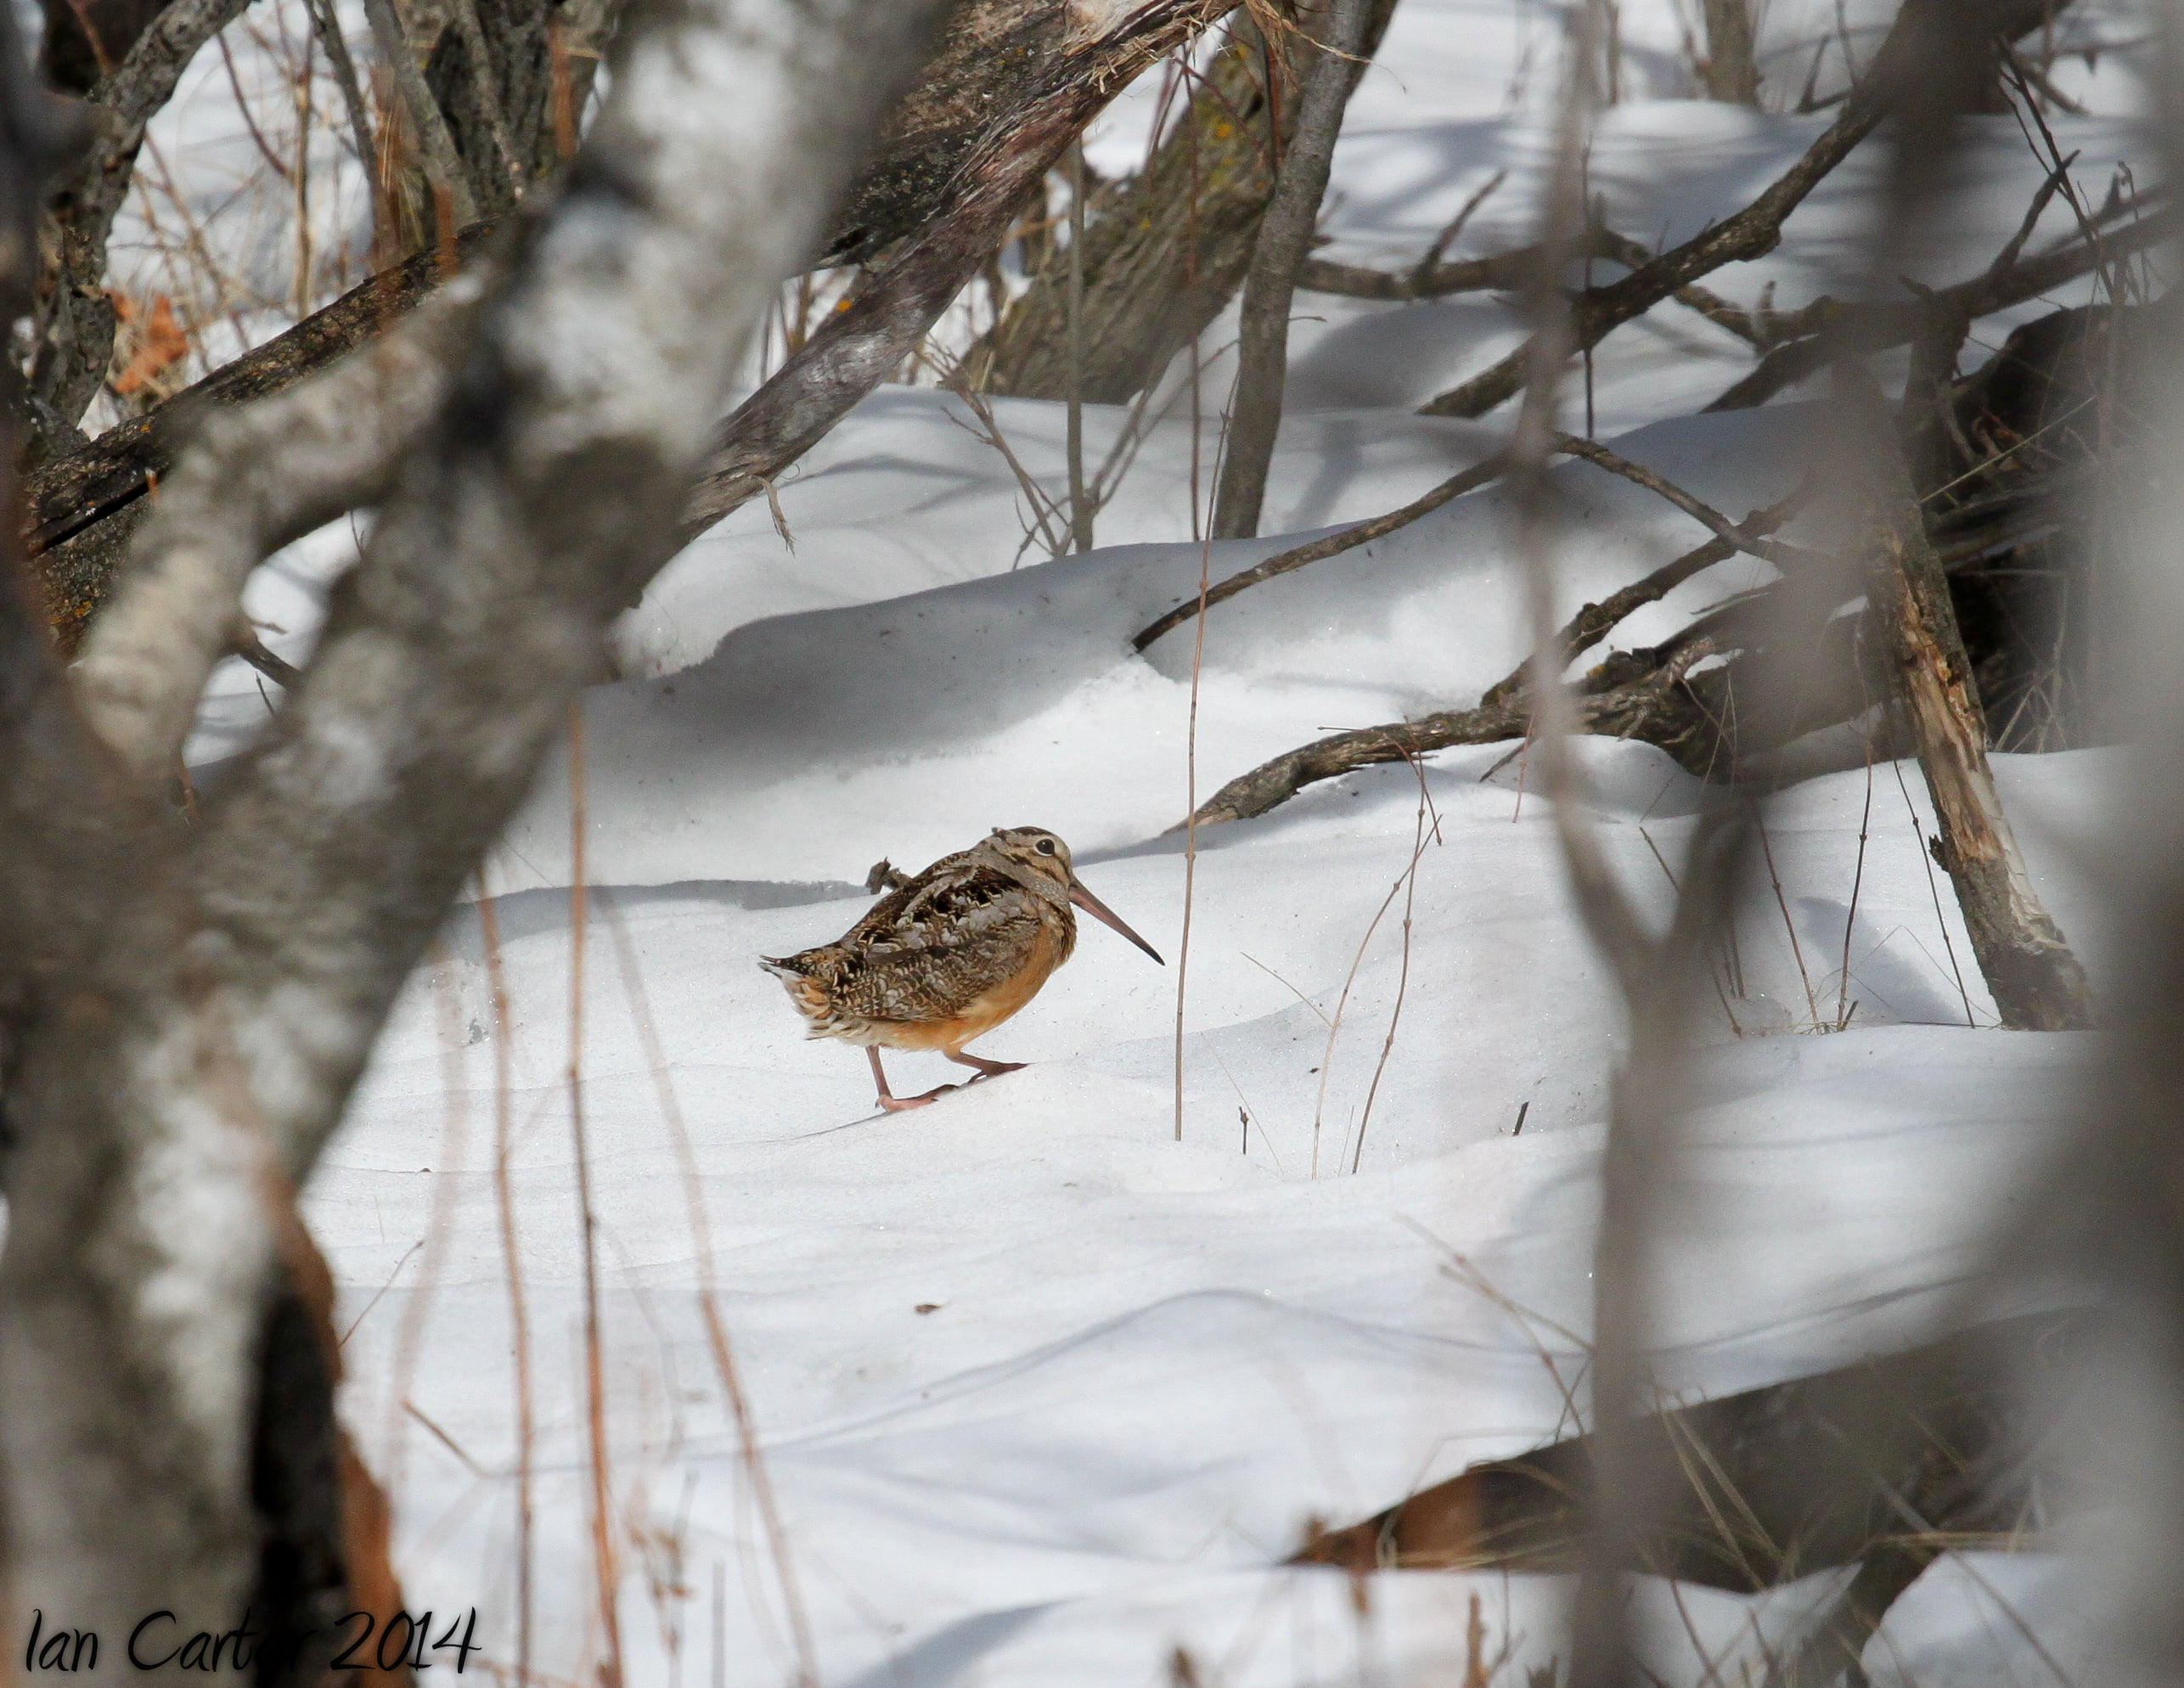 Woodcock - Photo by Ian Carter